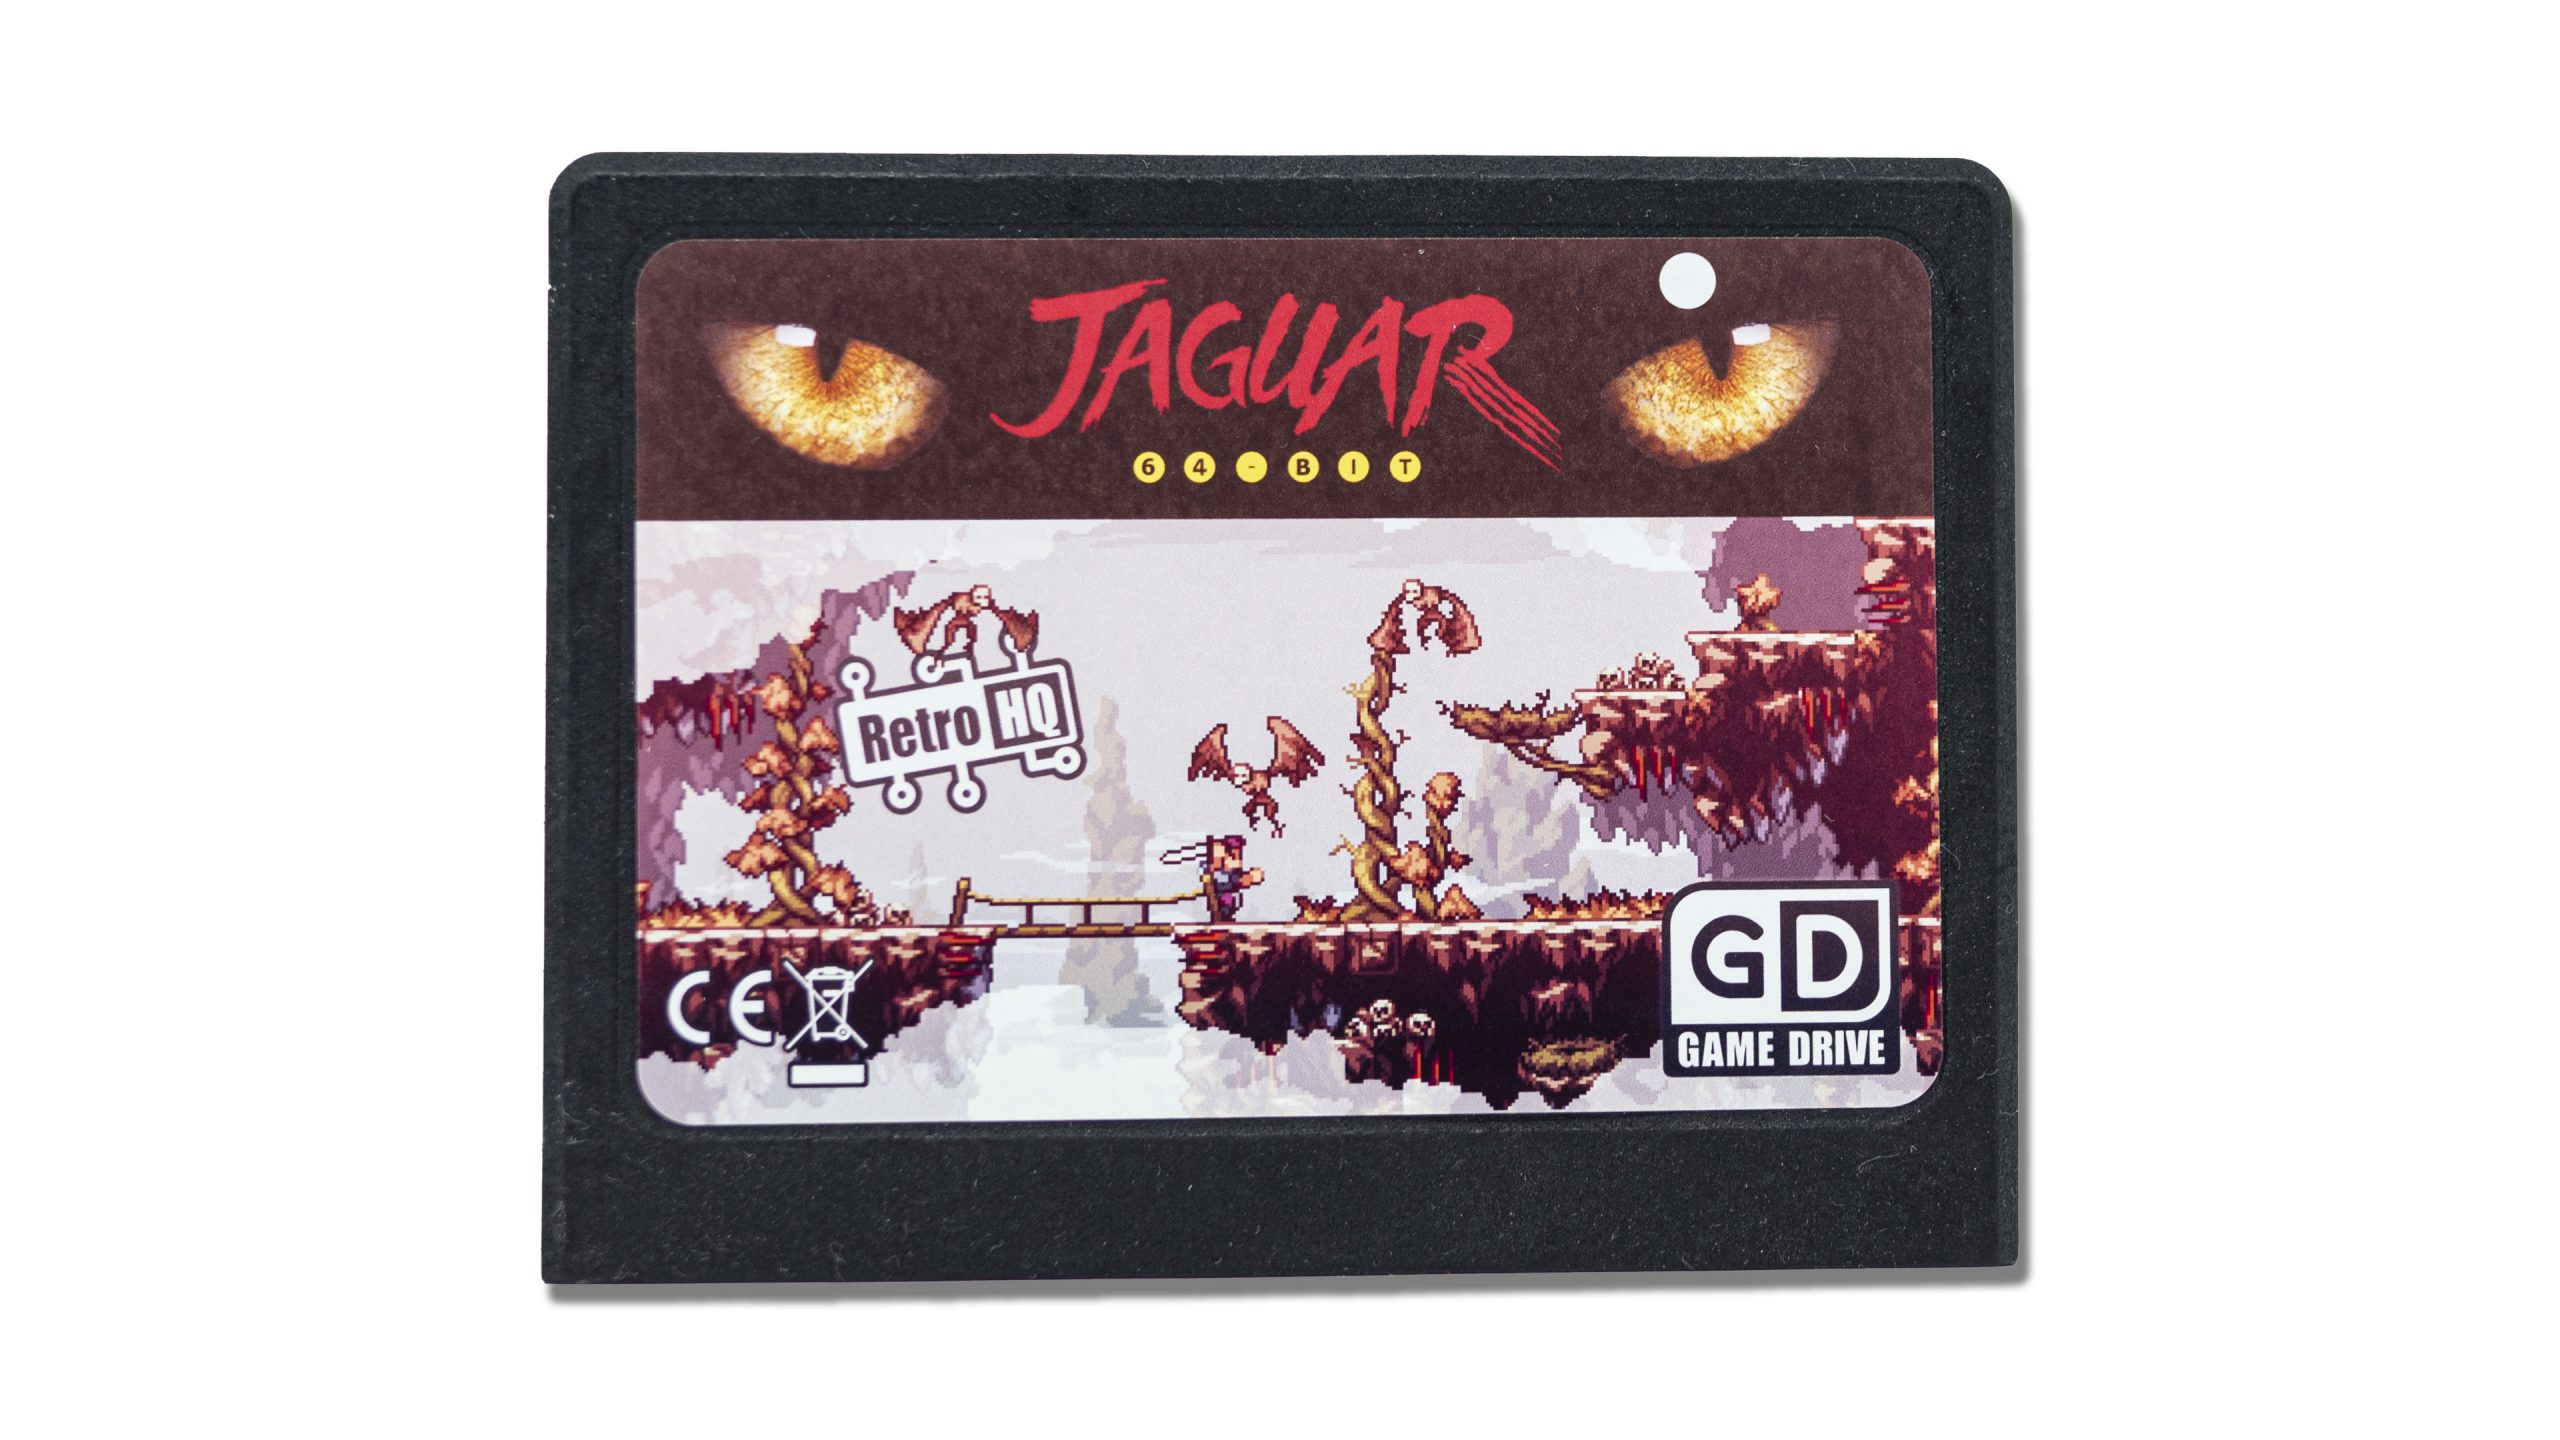 Jaguar GameDrive Pre-Orders Open